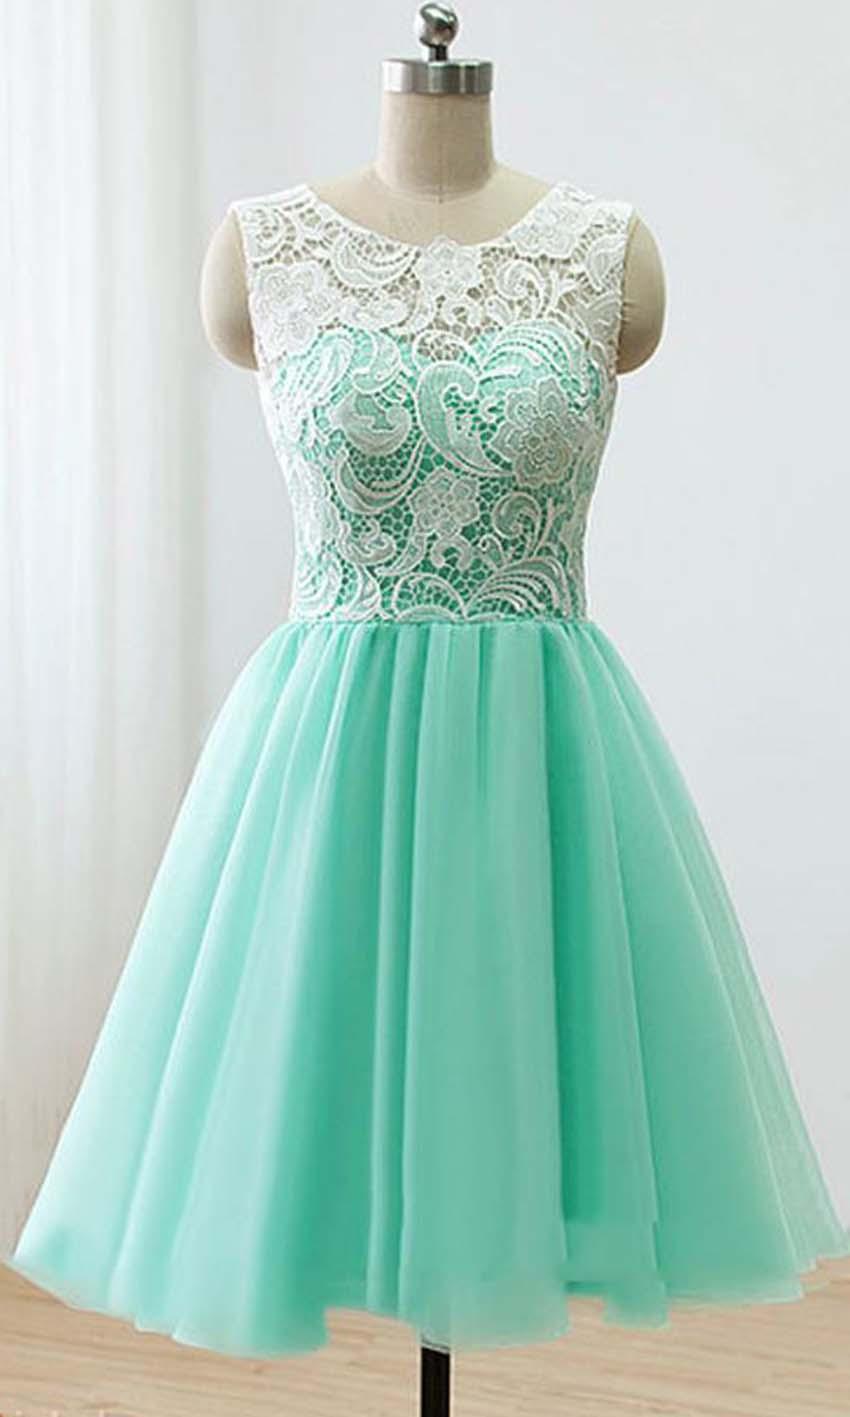 Nice White Party Dresses 2014 Embellishment - All Wedding Dresses ...